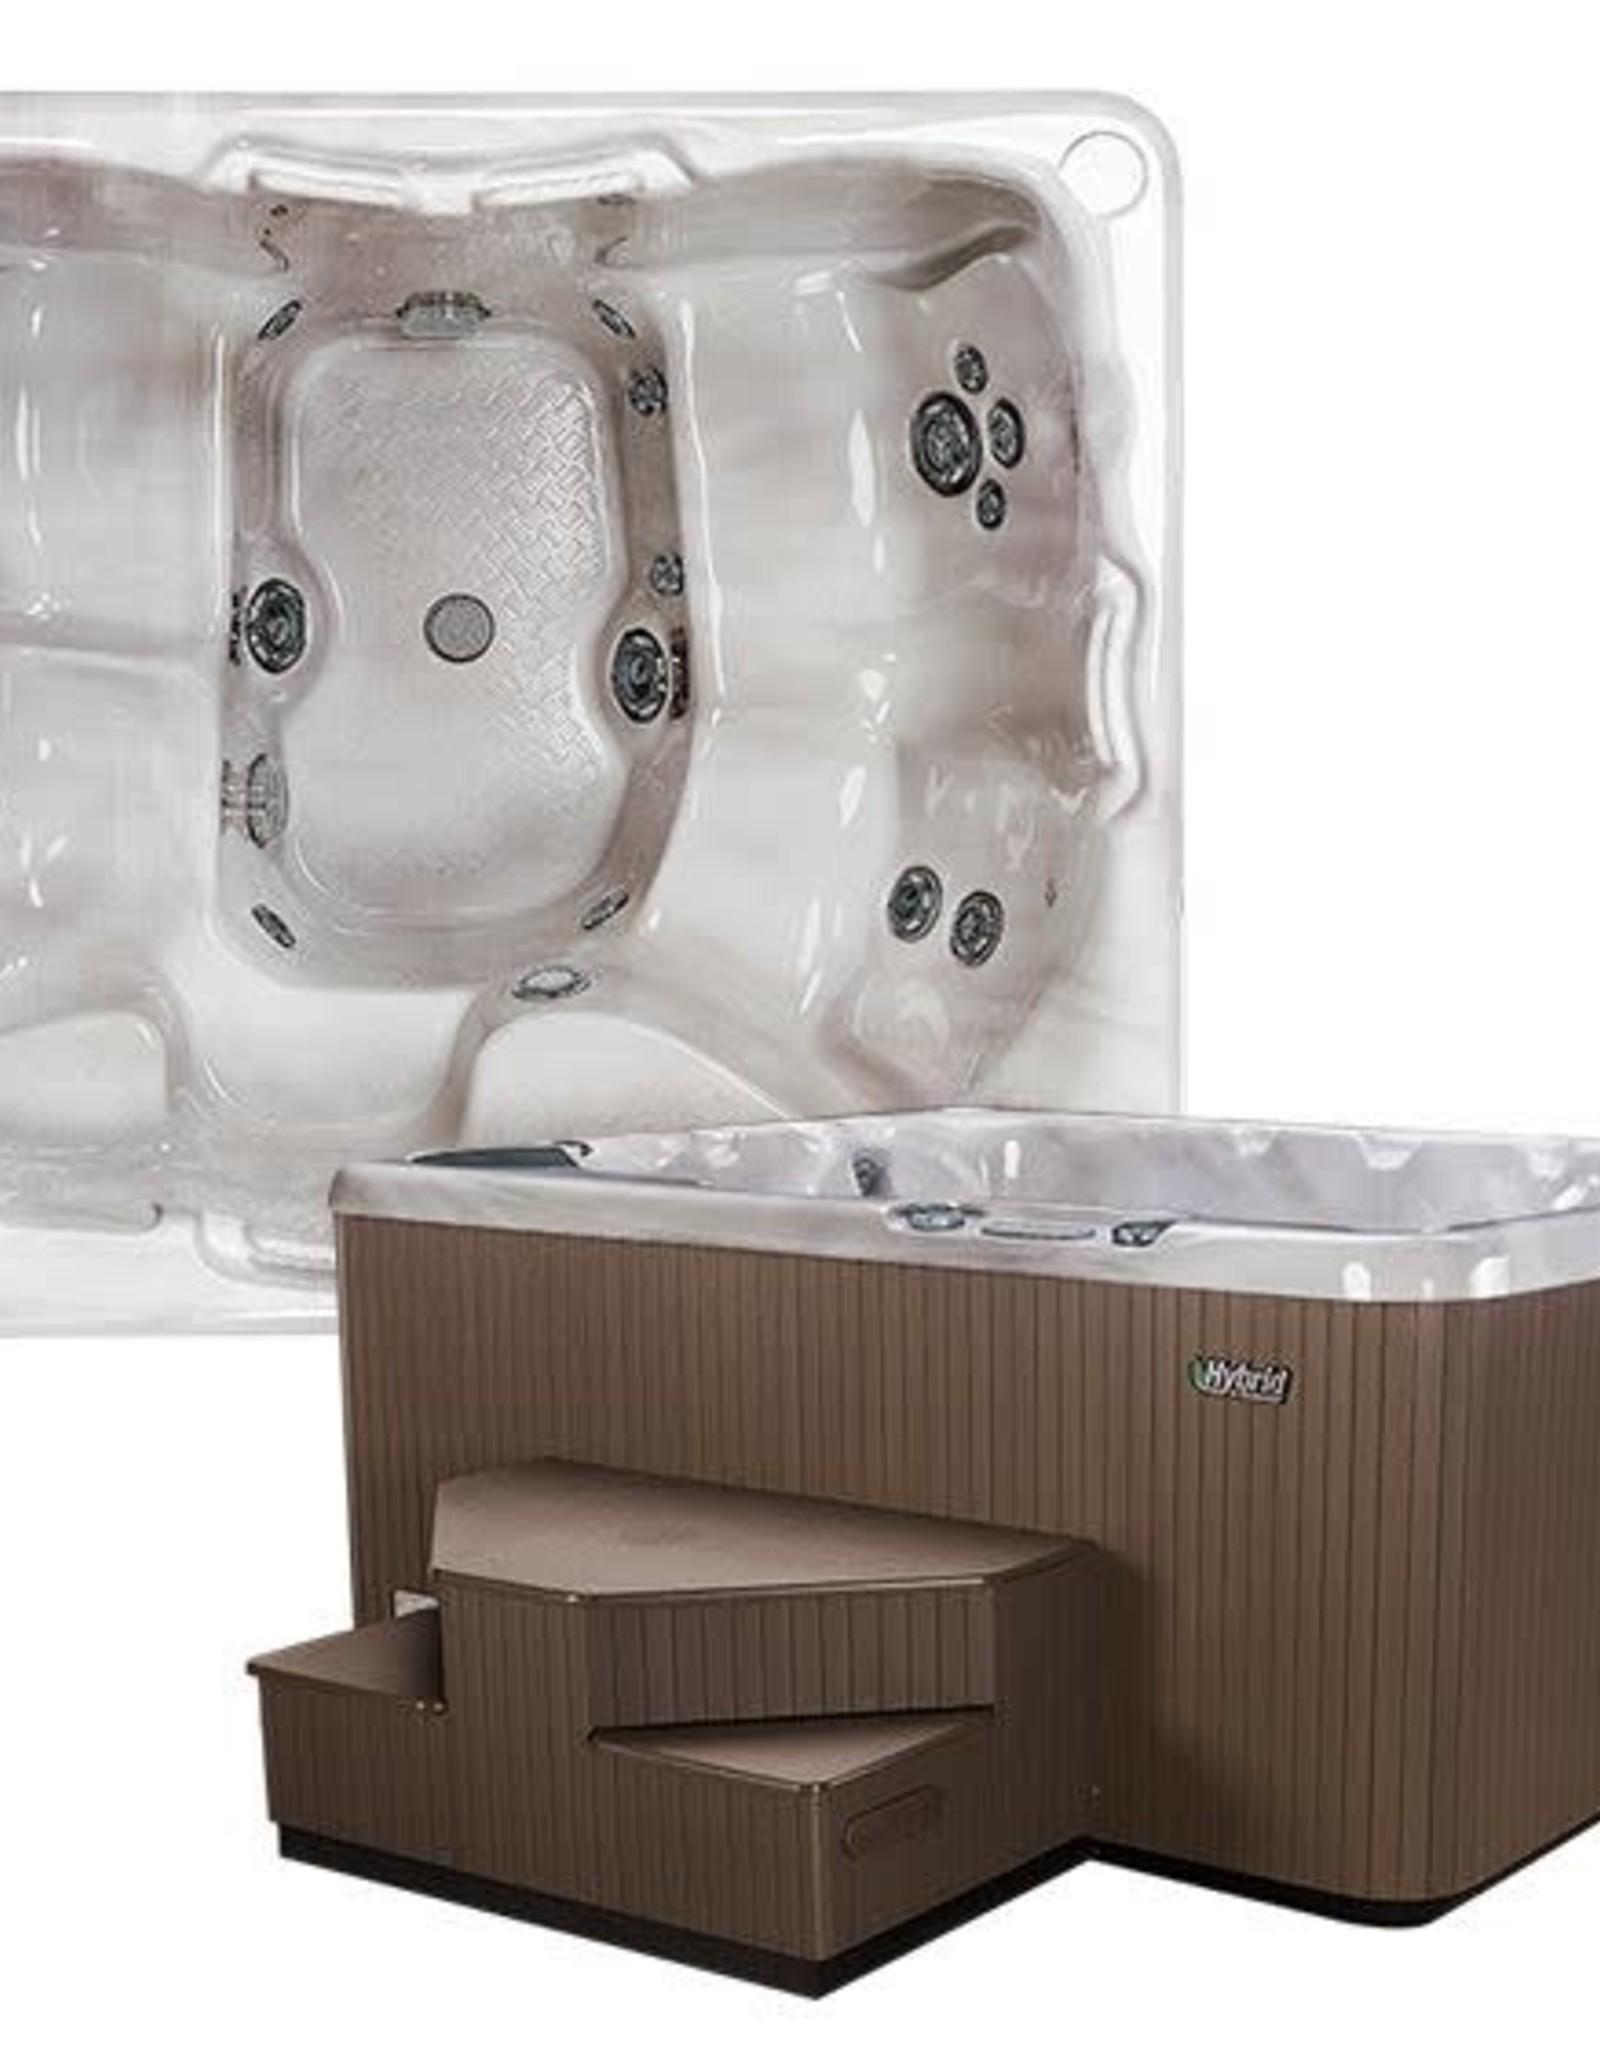 BEACHCOMBER BEACHCOMBER -MODEL 530 HYBRID4® QS